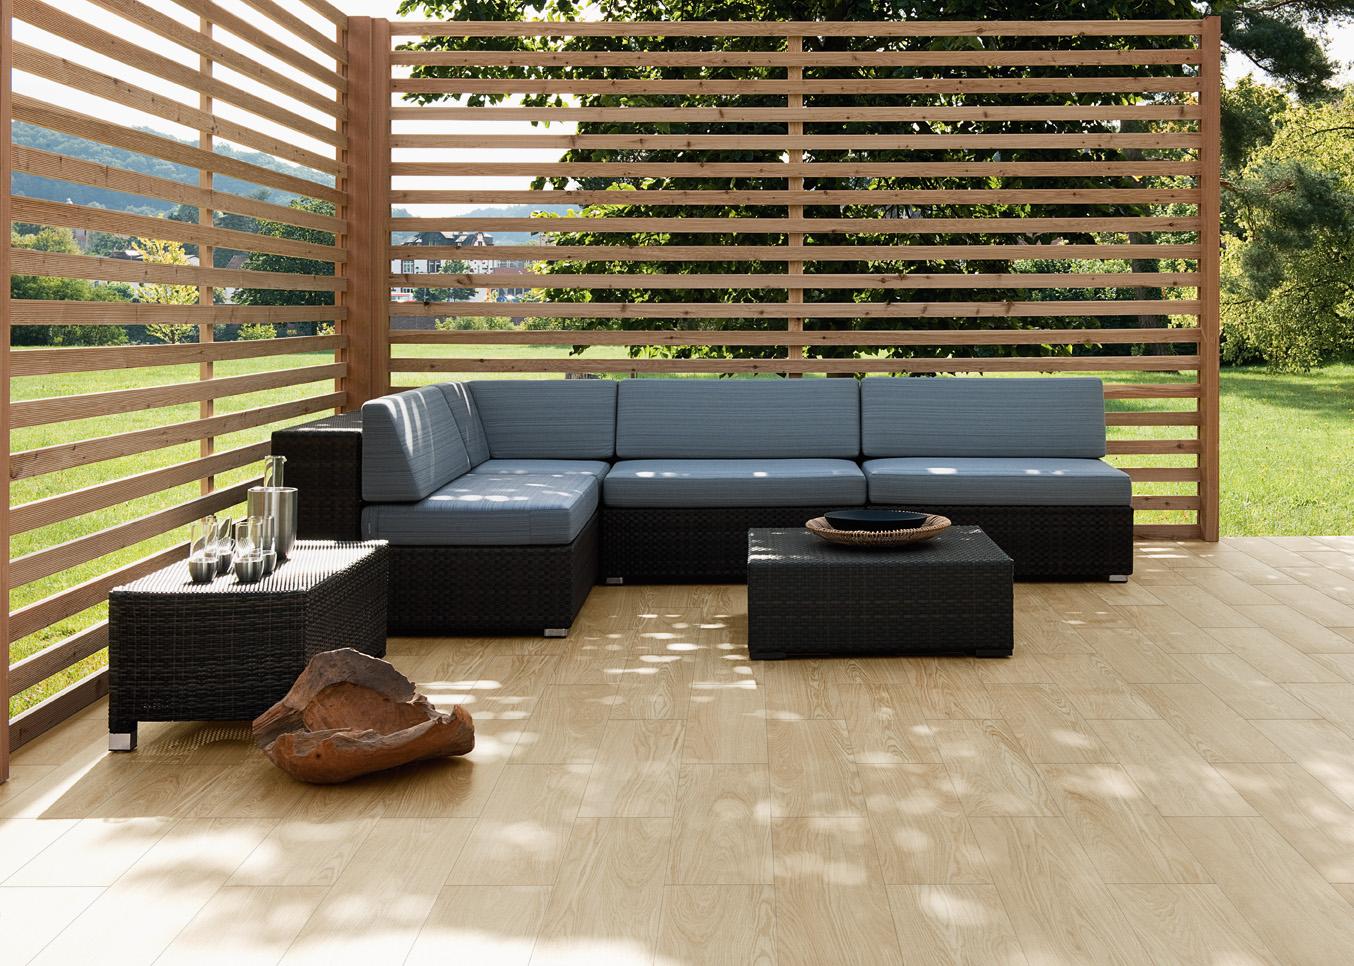 balkon terrasse lachnitt bau keramik. Black Bedroom Furniture Sets. Home Design Ideas